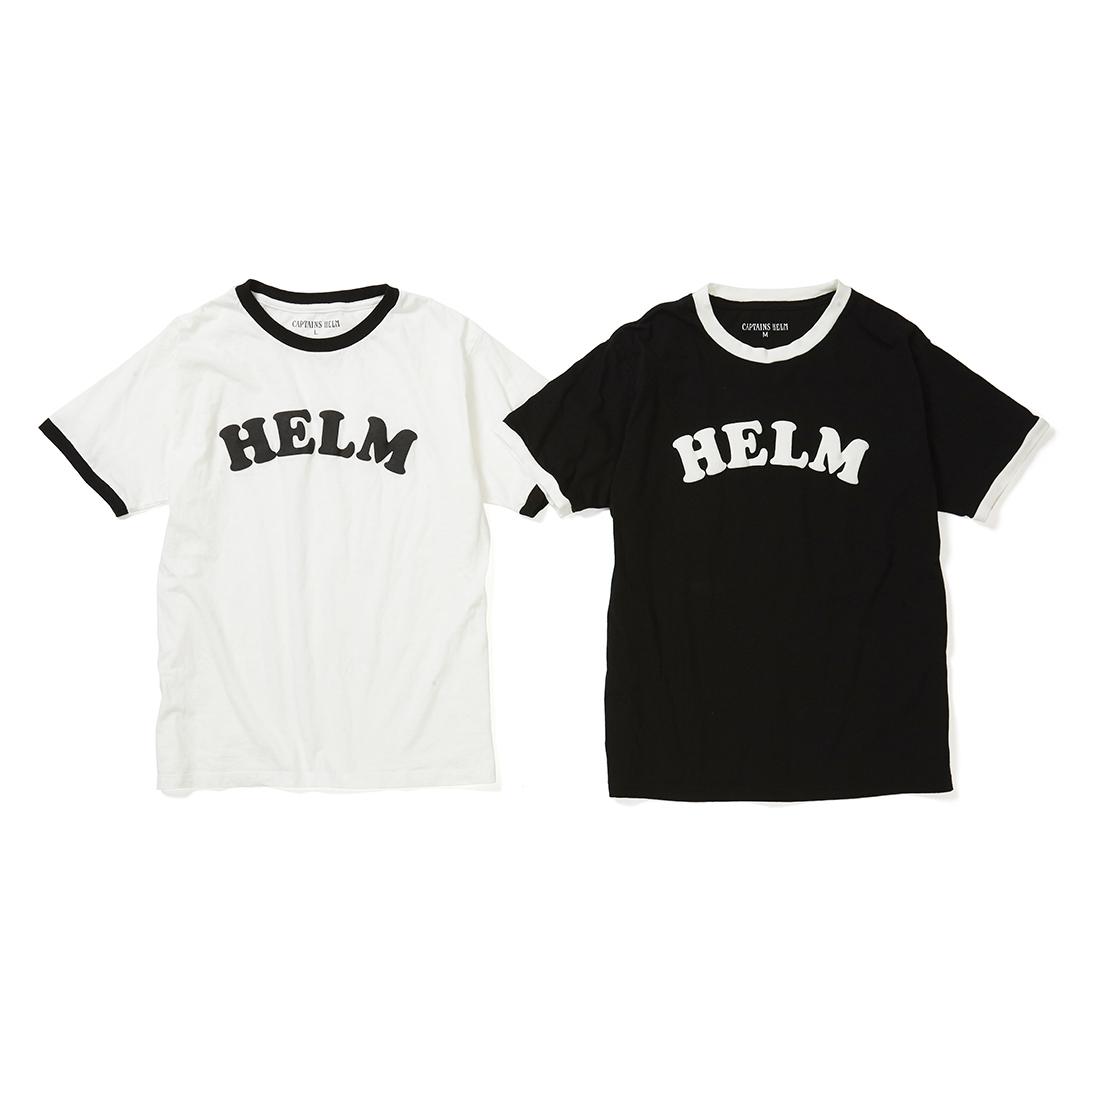 Captains Helm キャプテンズヘルム HELM TRIM TEE  ヘルムトリムTシャツ 半袖 ロゴT